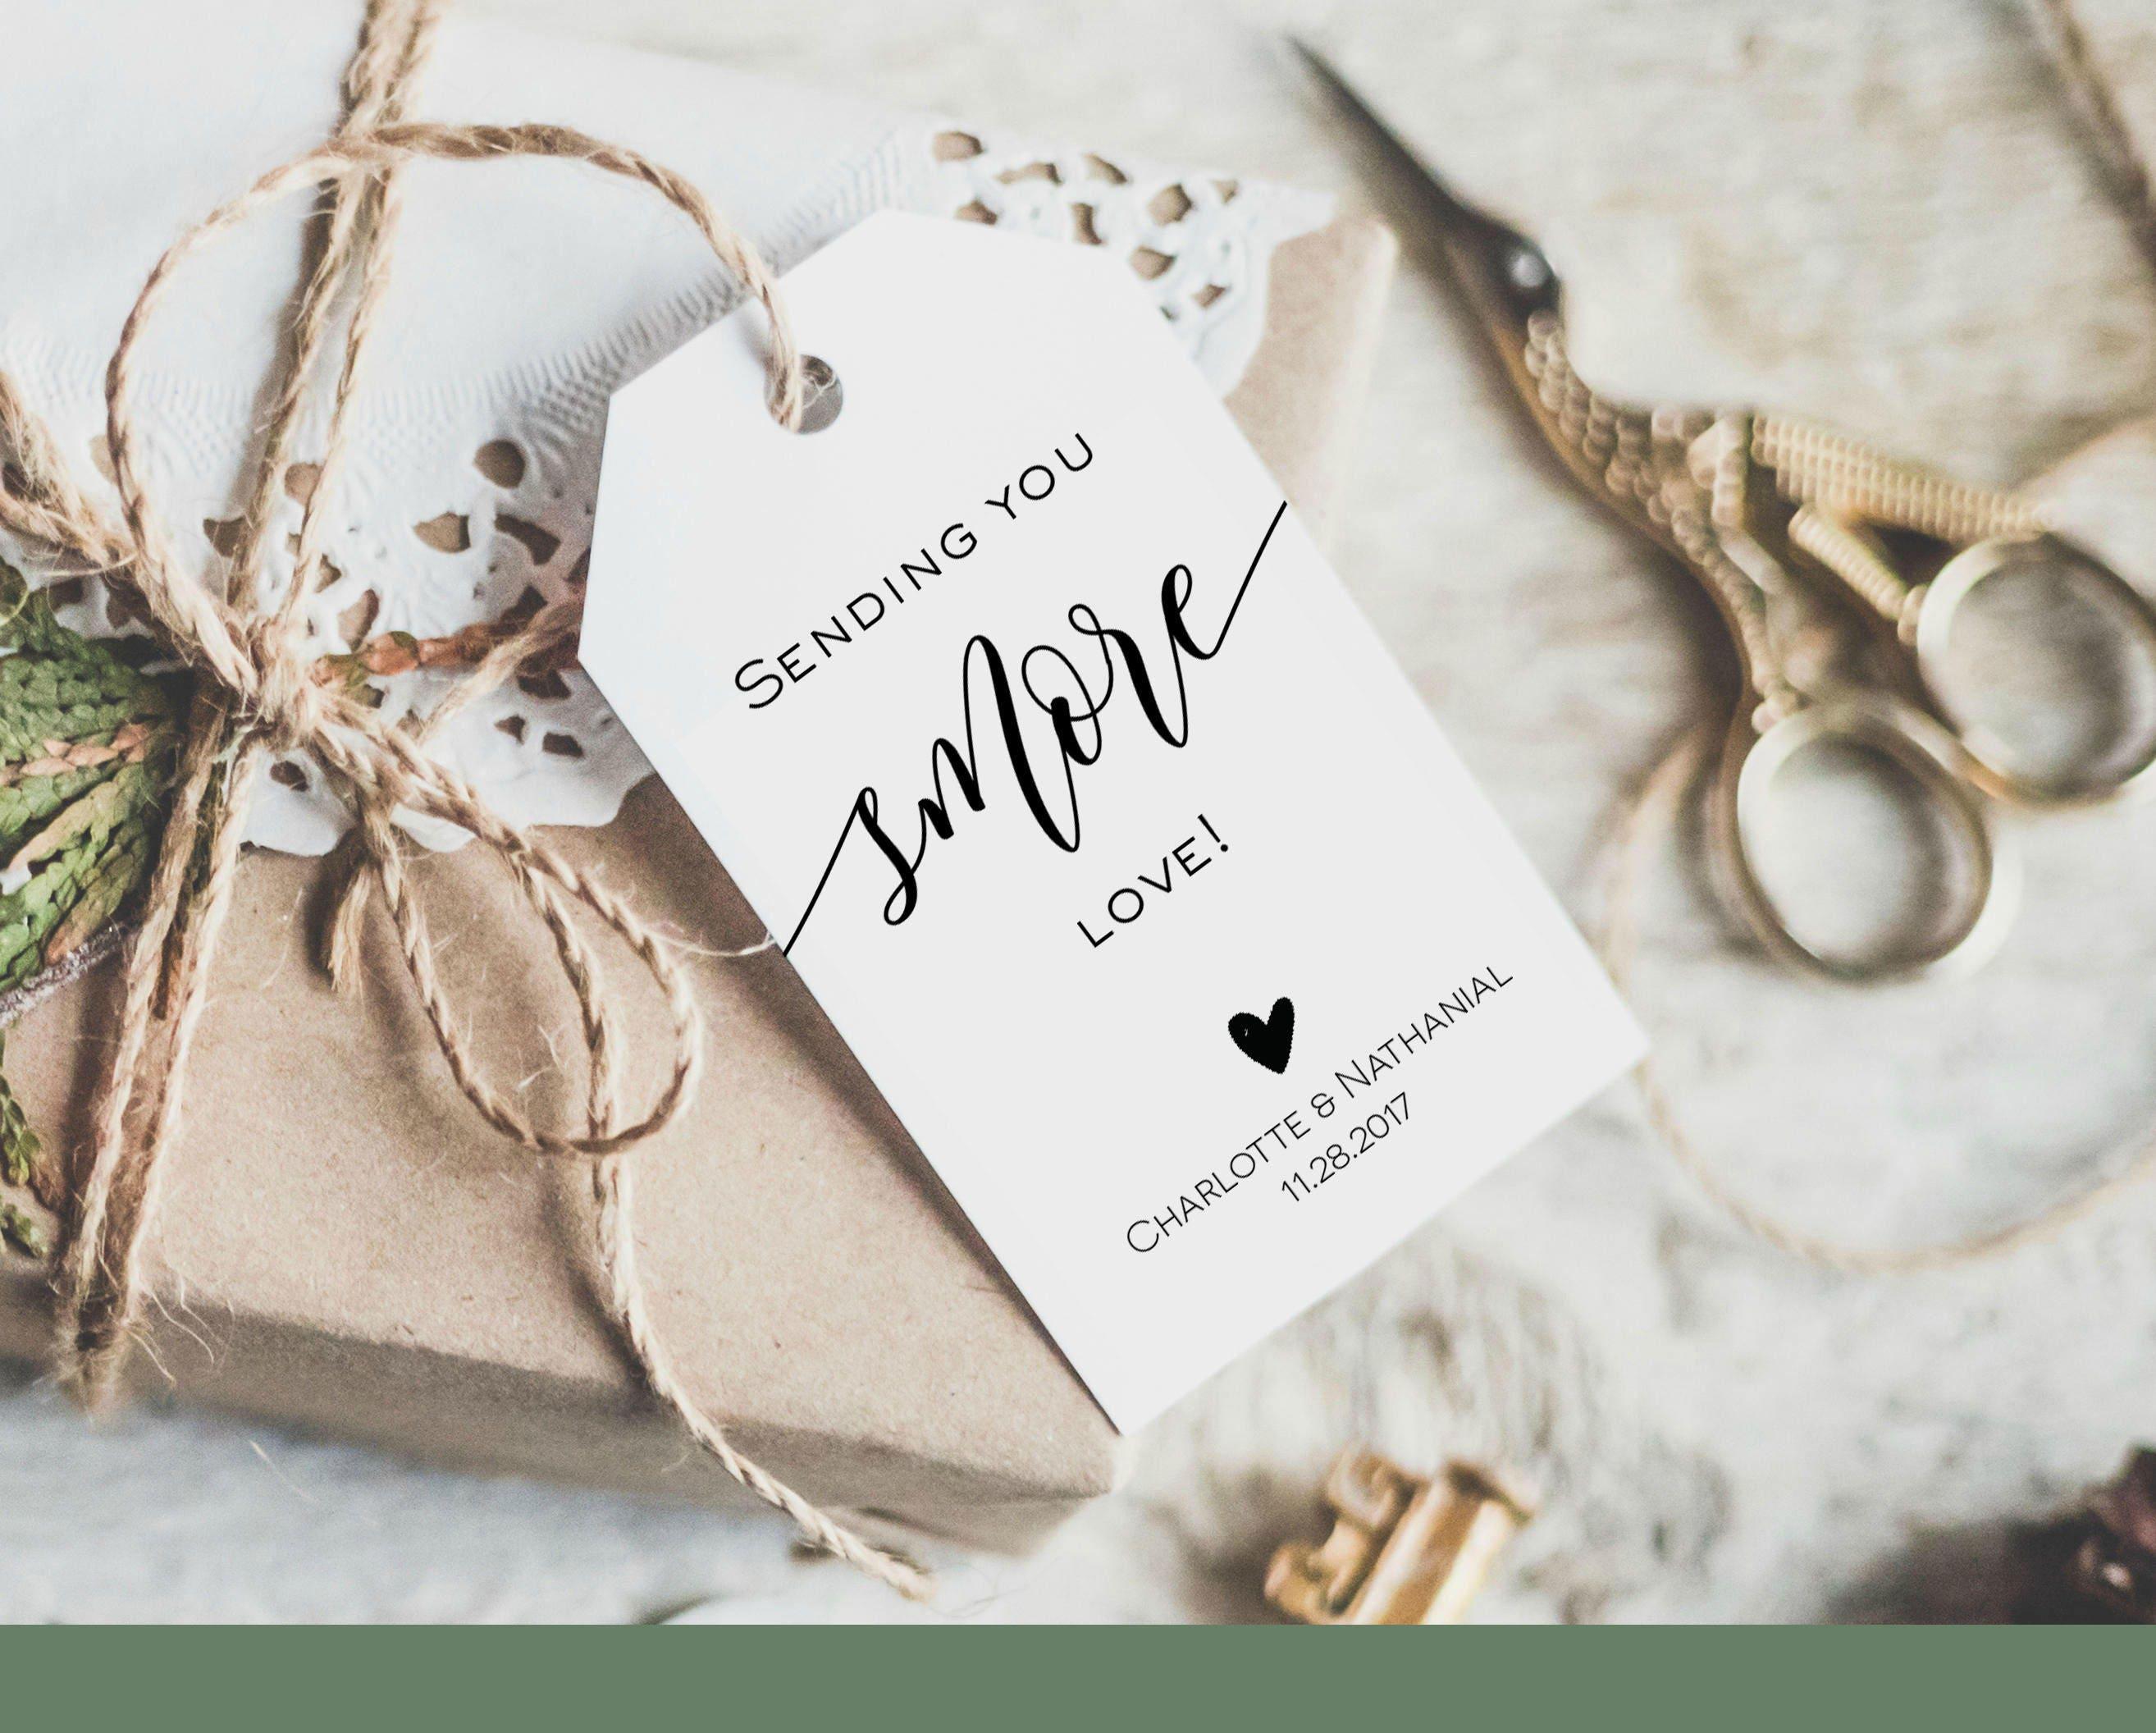 Sending you Smore Love Tag Wedding Favor Tag Template